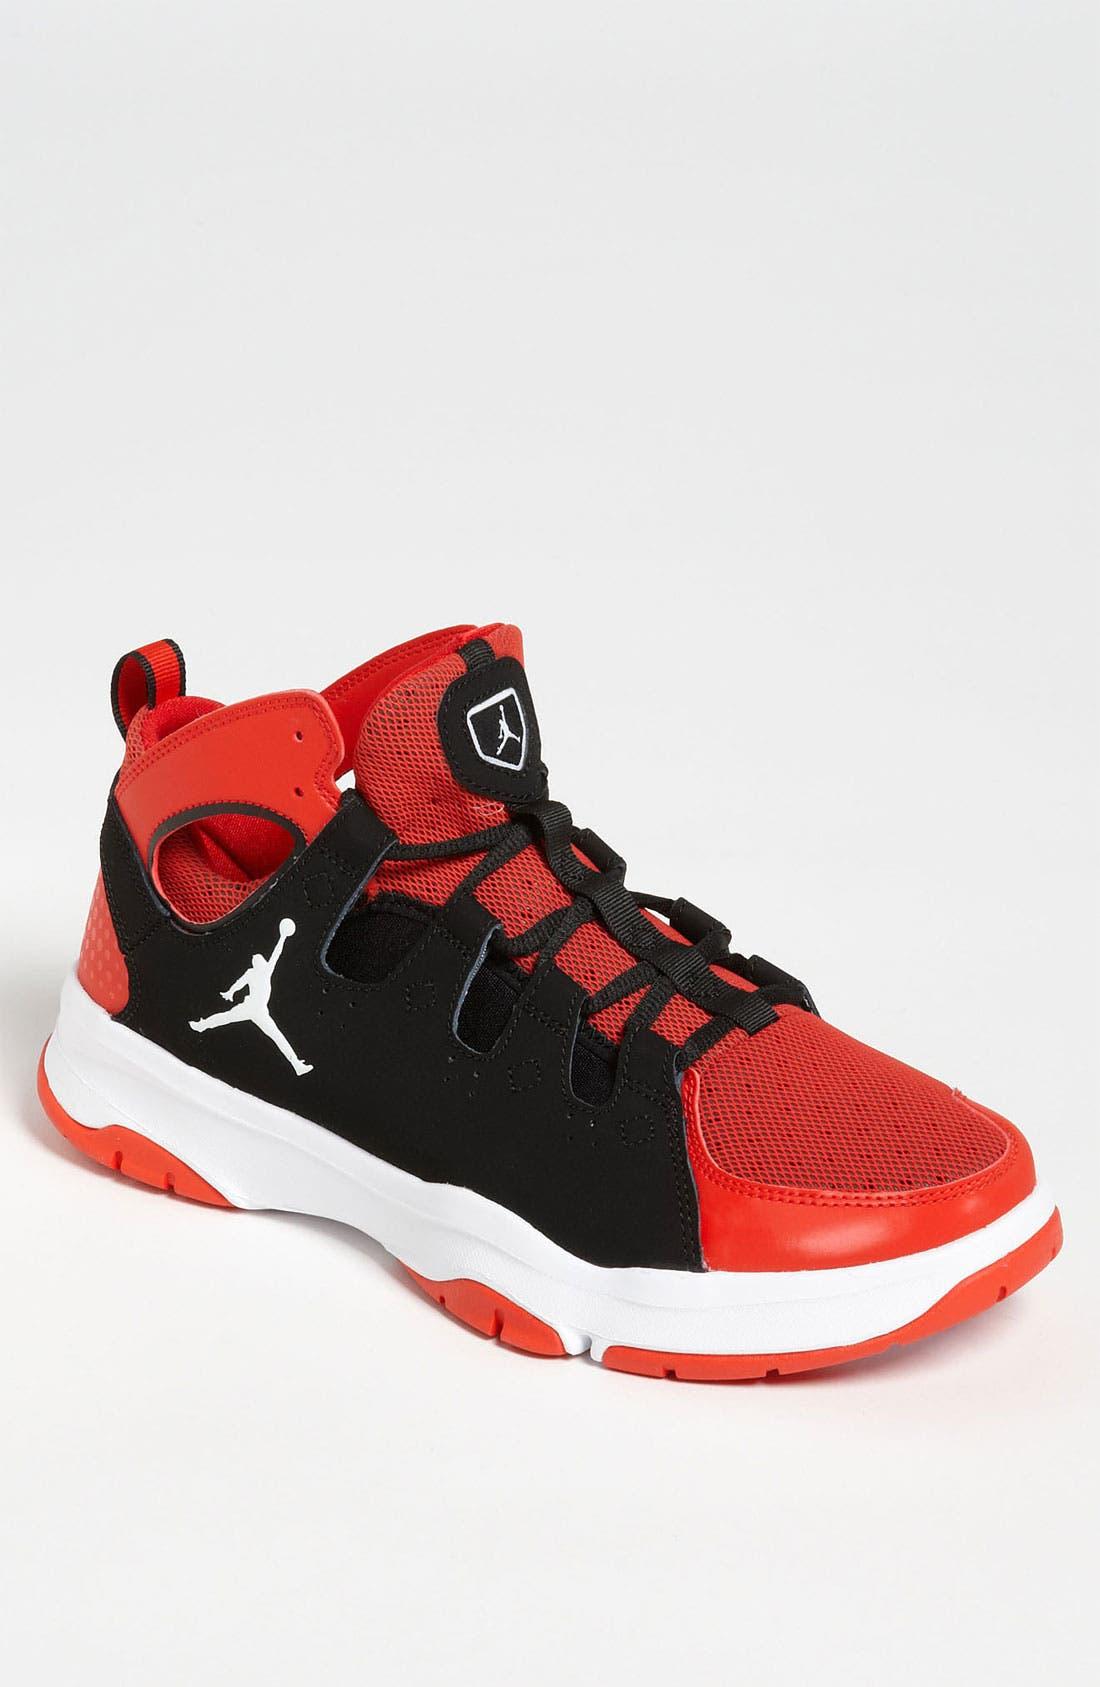 Main Image - Nike 'Jordan Legend TR' Basketball Shoe (Men)